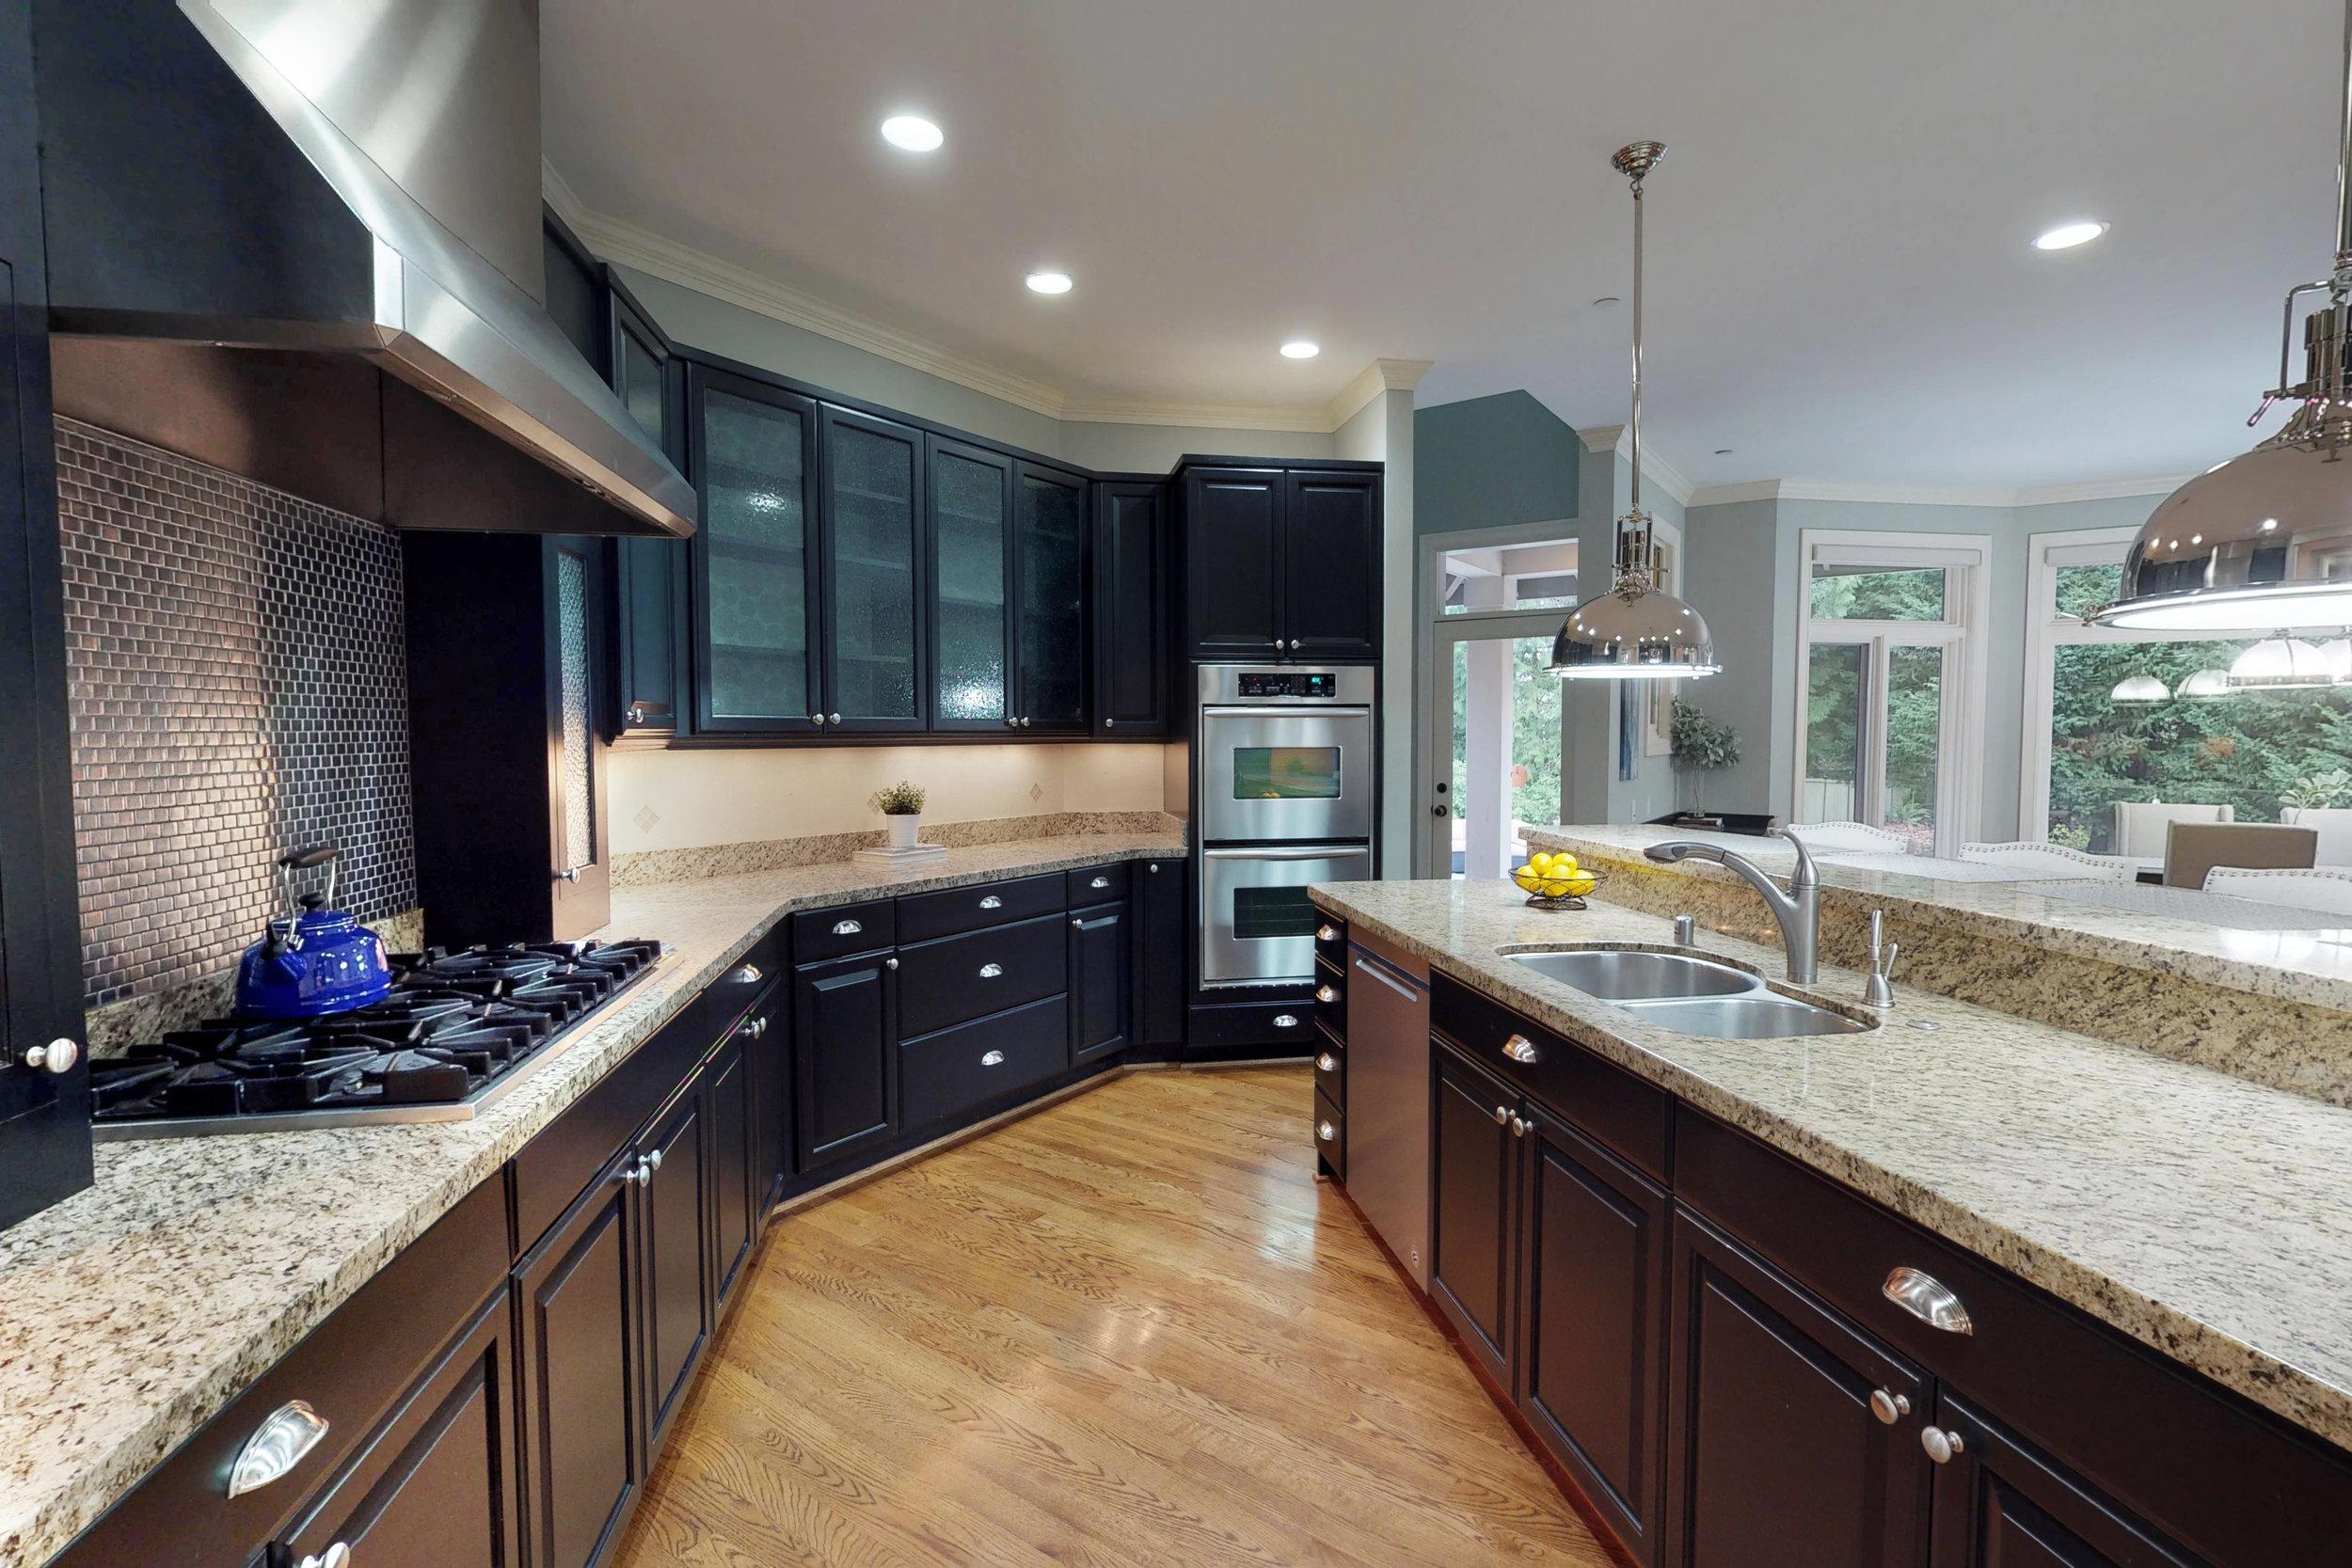 luxury kitchen photography.jpg